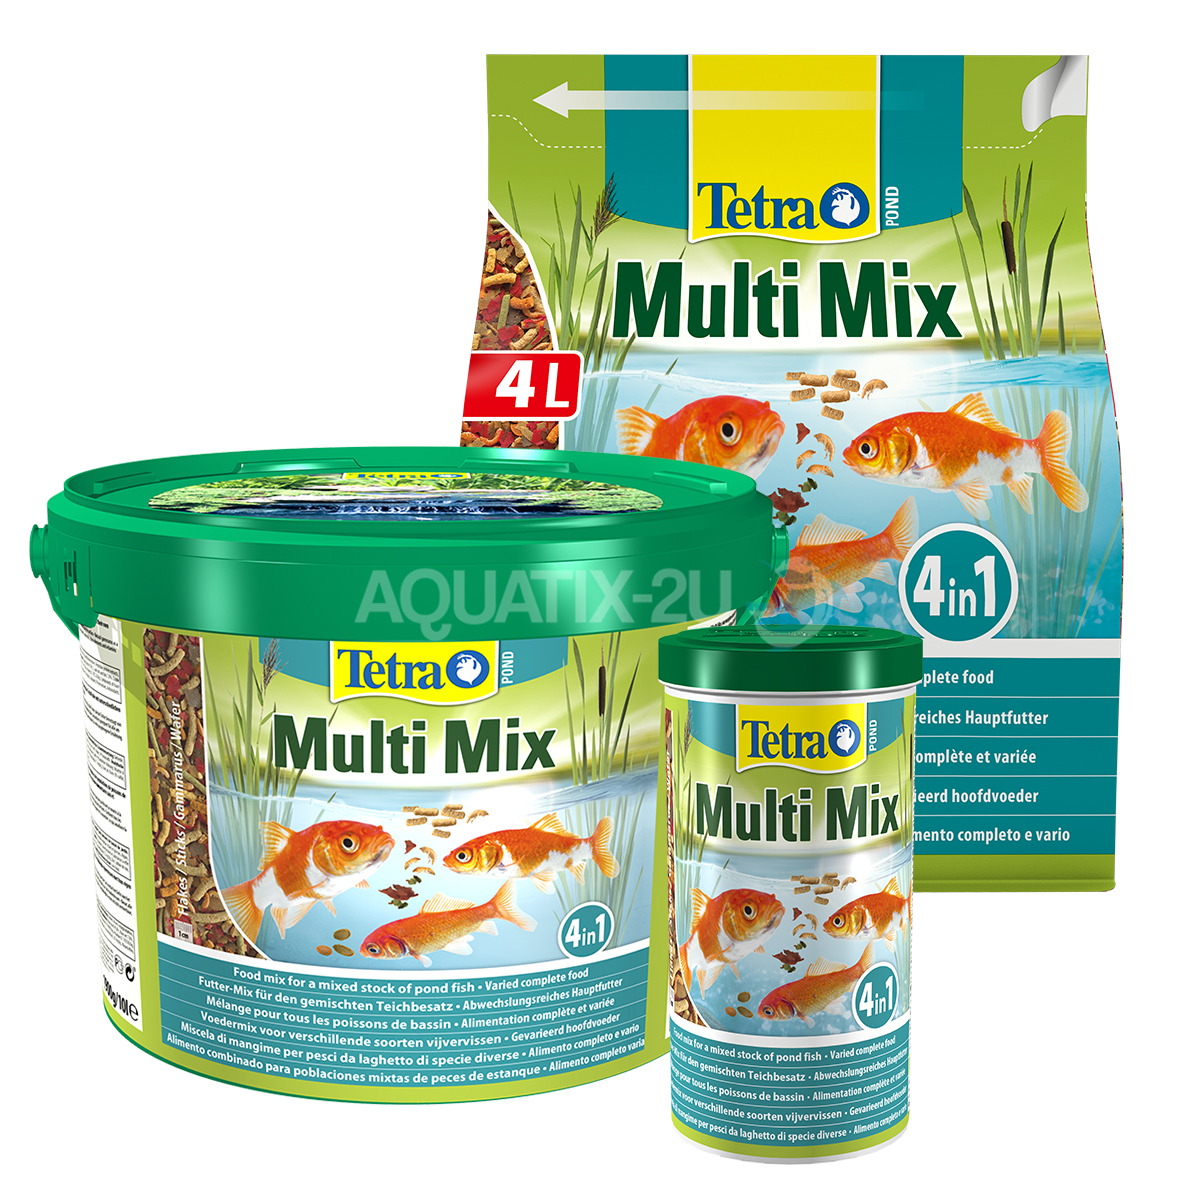 tetra pond multi mix fish food. Black Bedroom Furniture Sets. Home Design Ideas